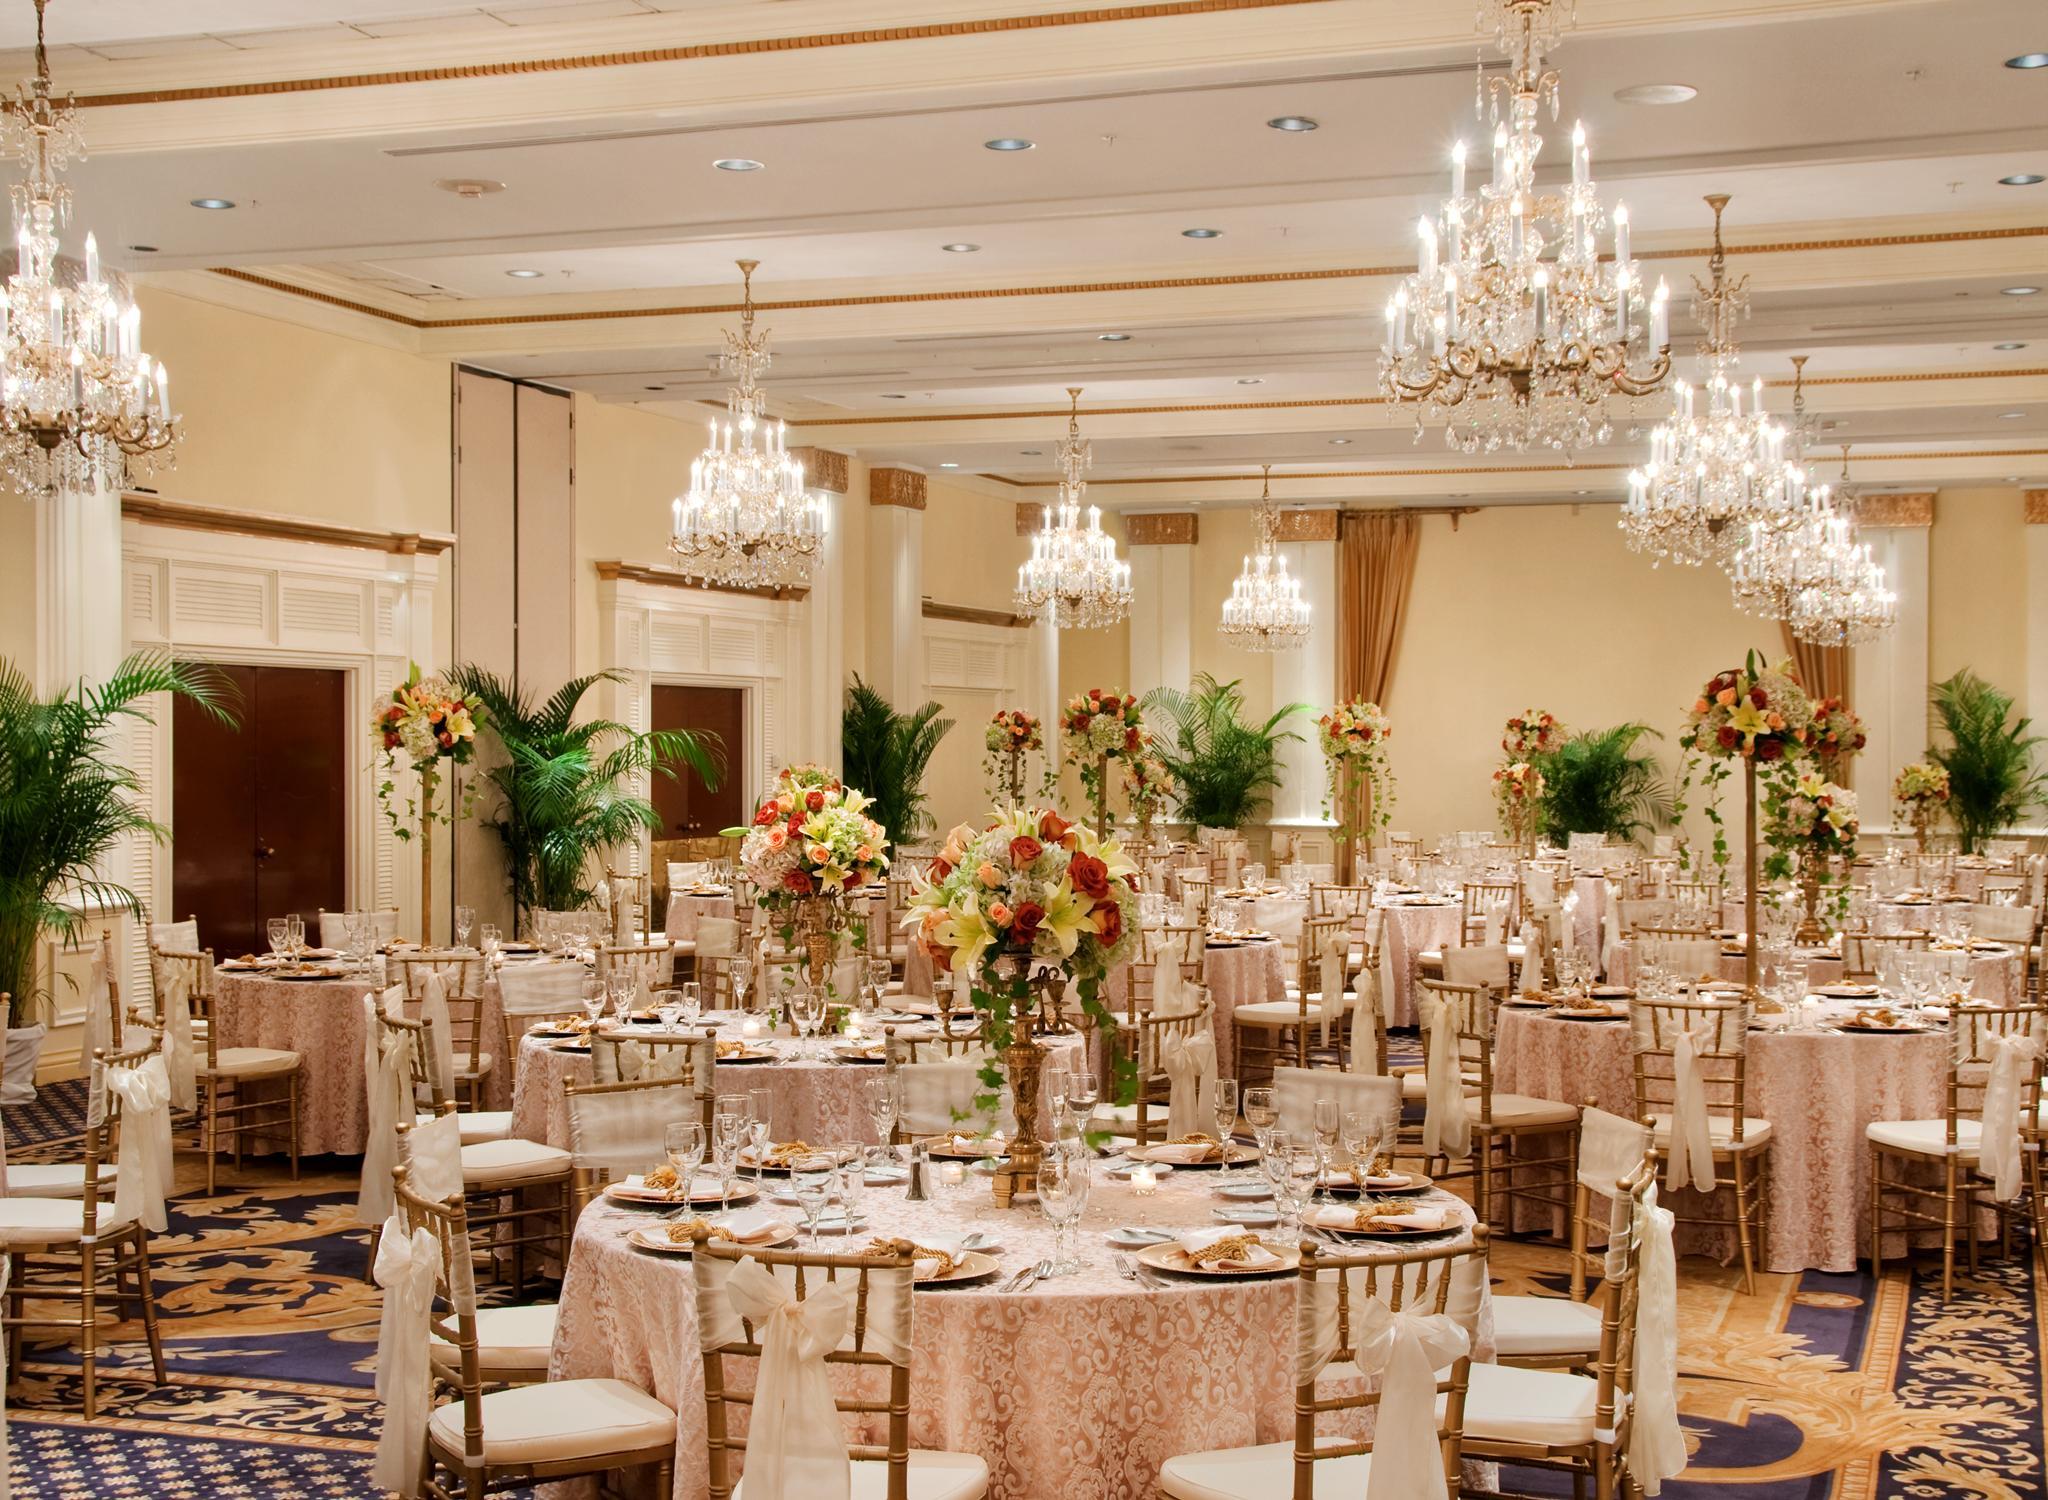 British Colonial Hilton Nassau, Bahamas – Banquete